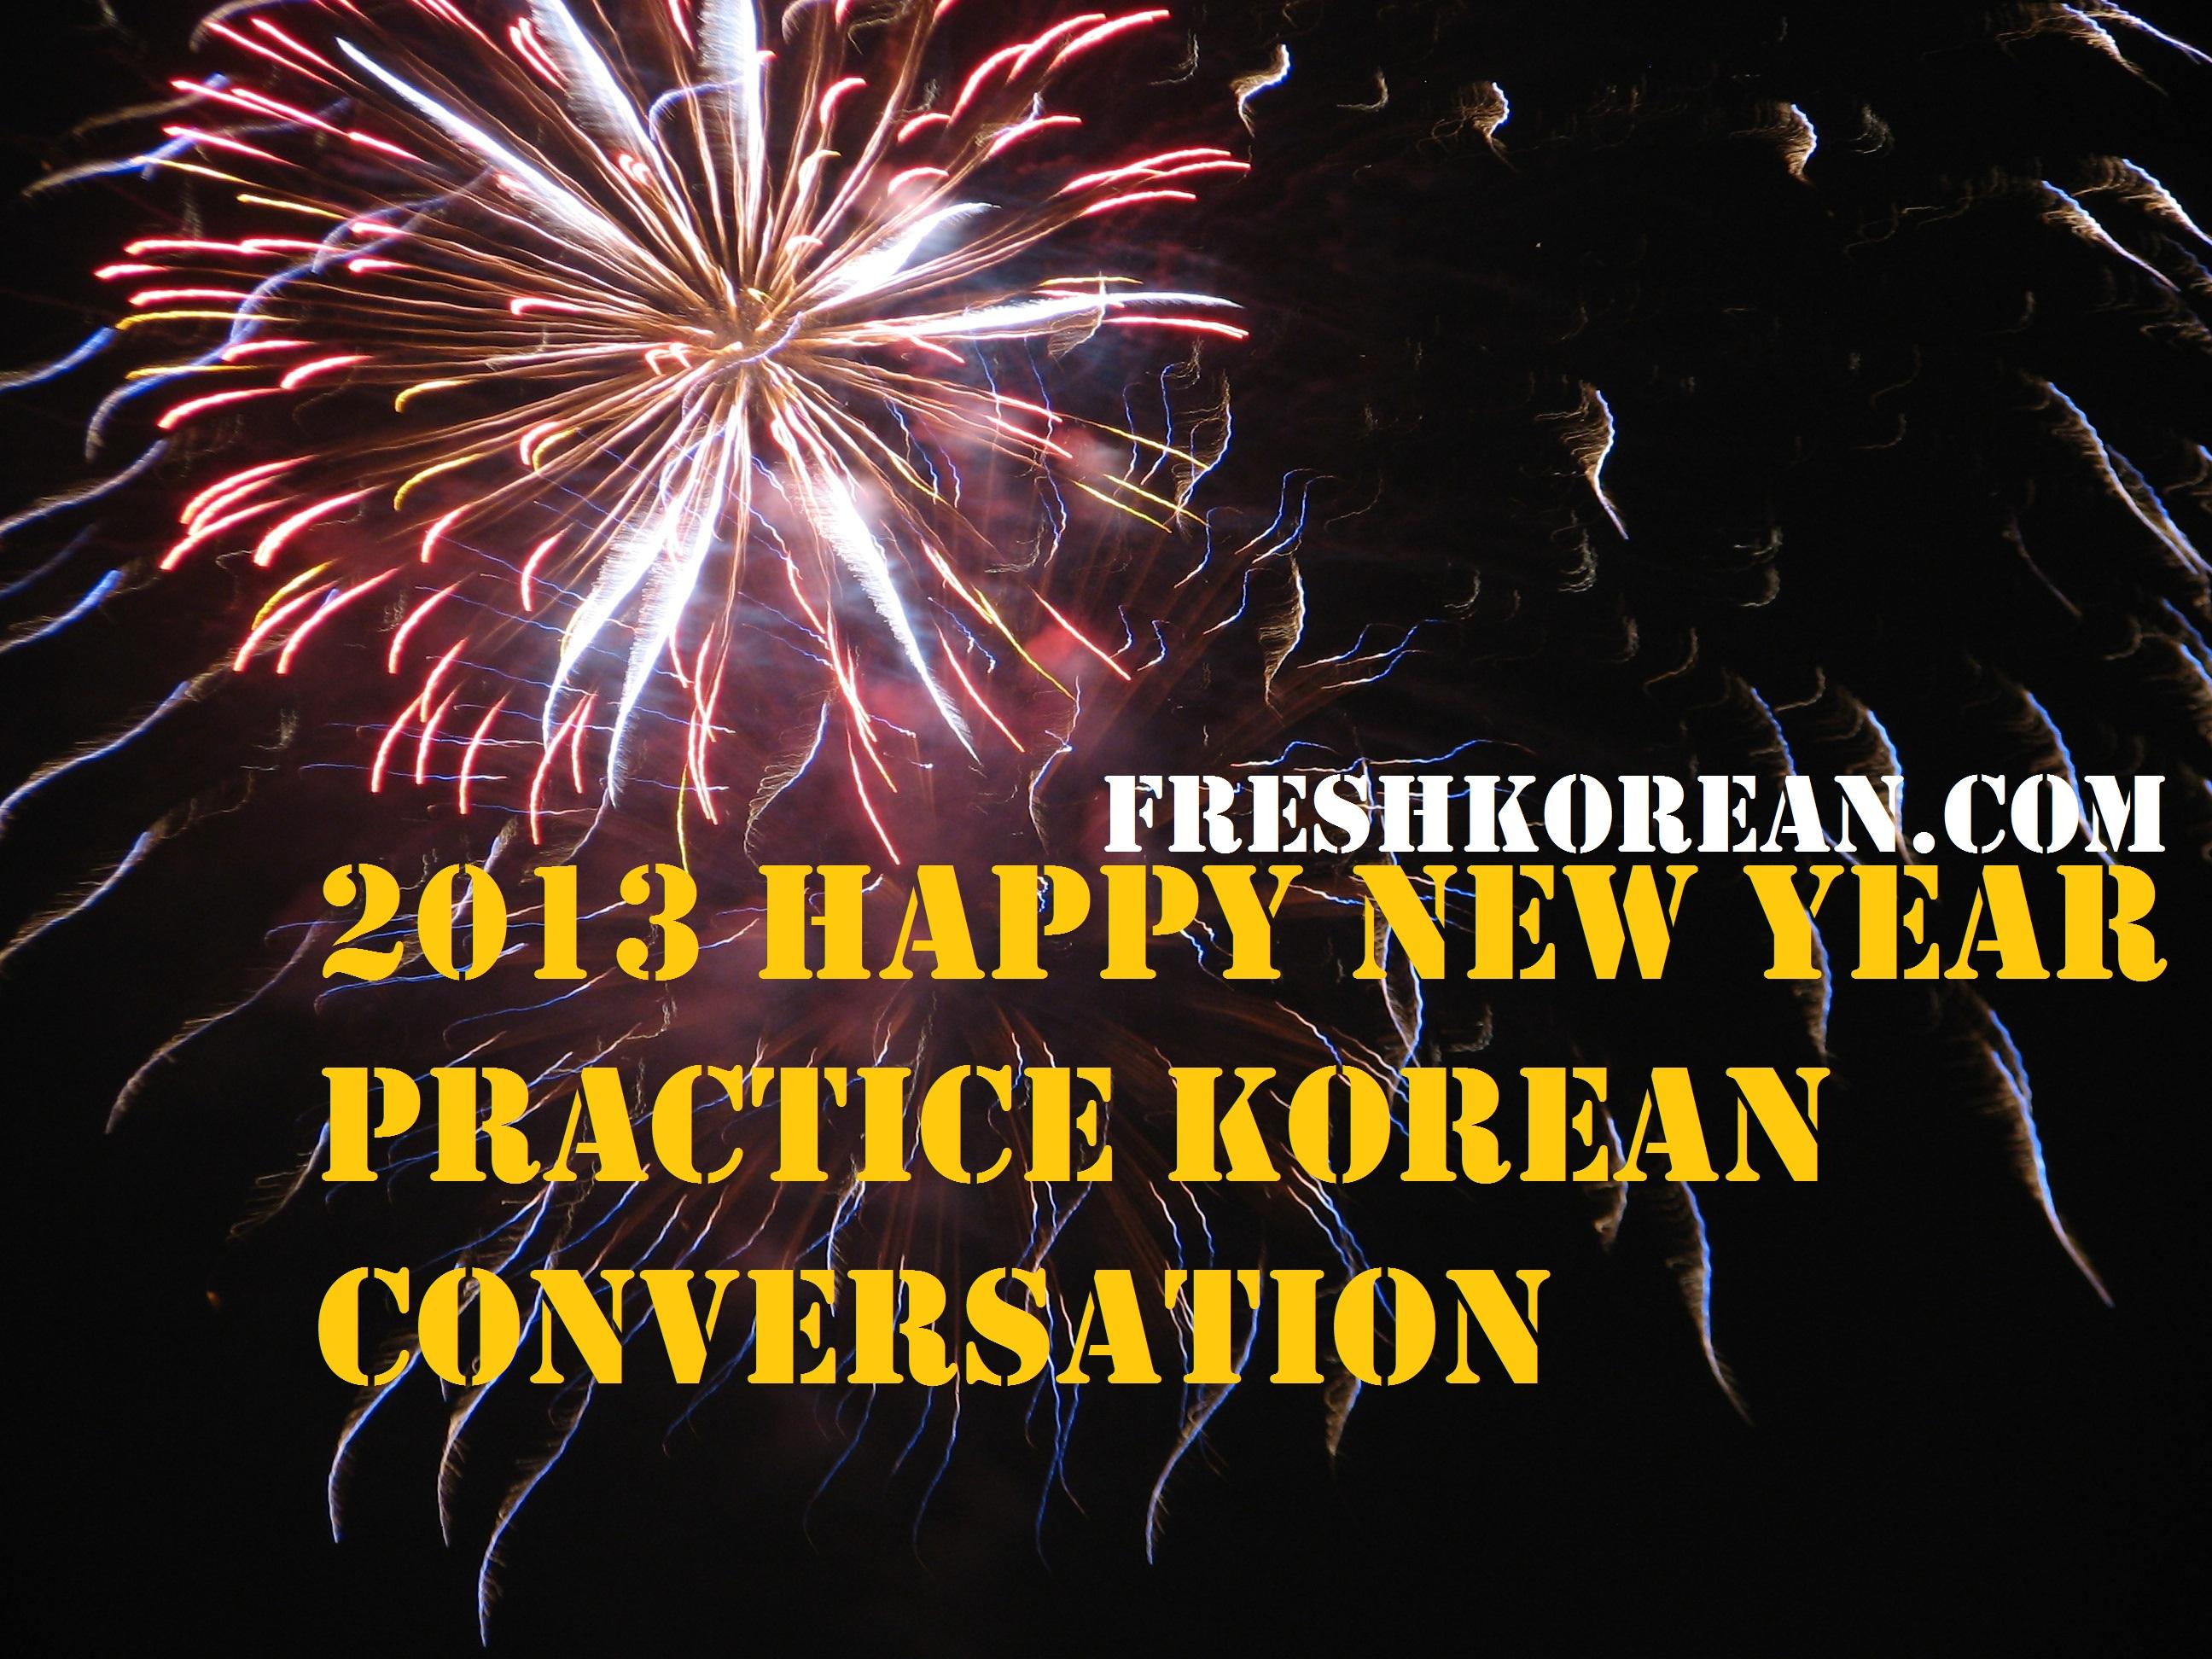 fresh korean happy new year 2013